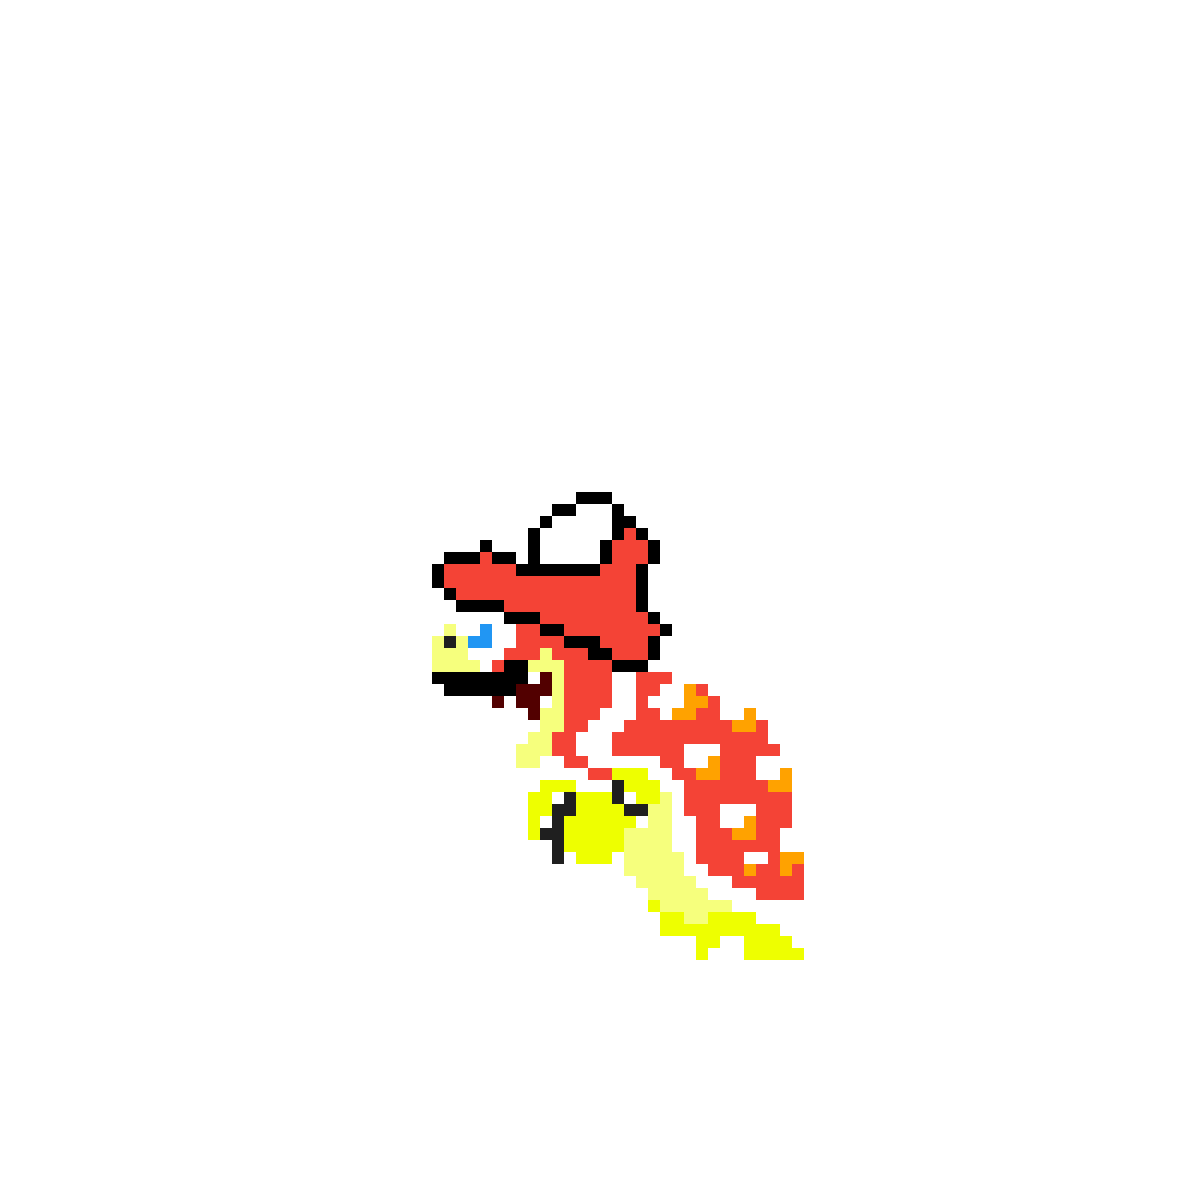 Bowser mario by PixelPixelArt